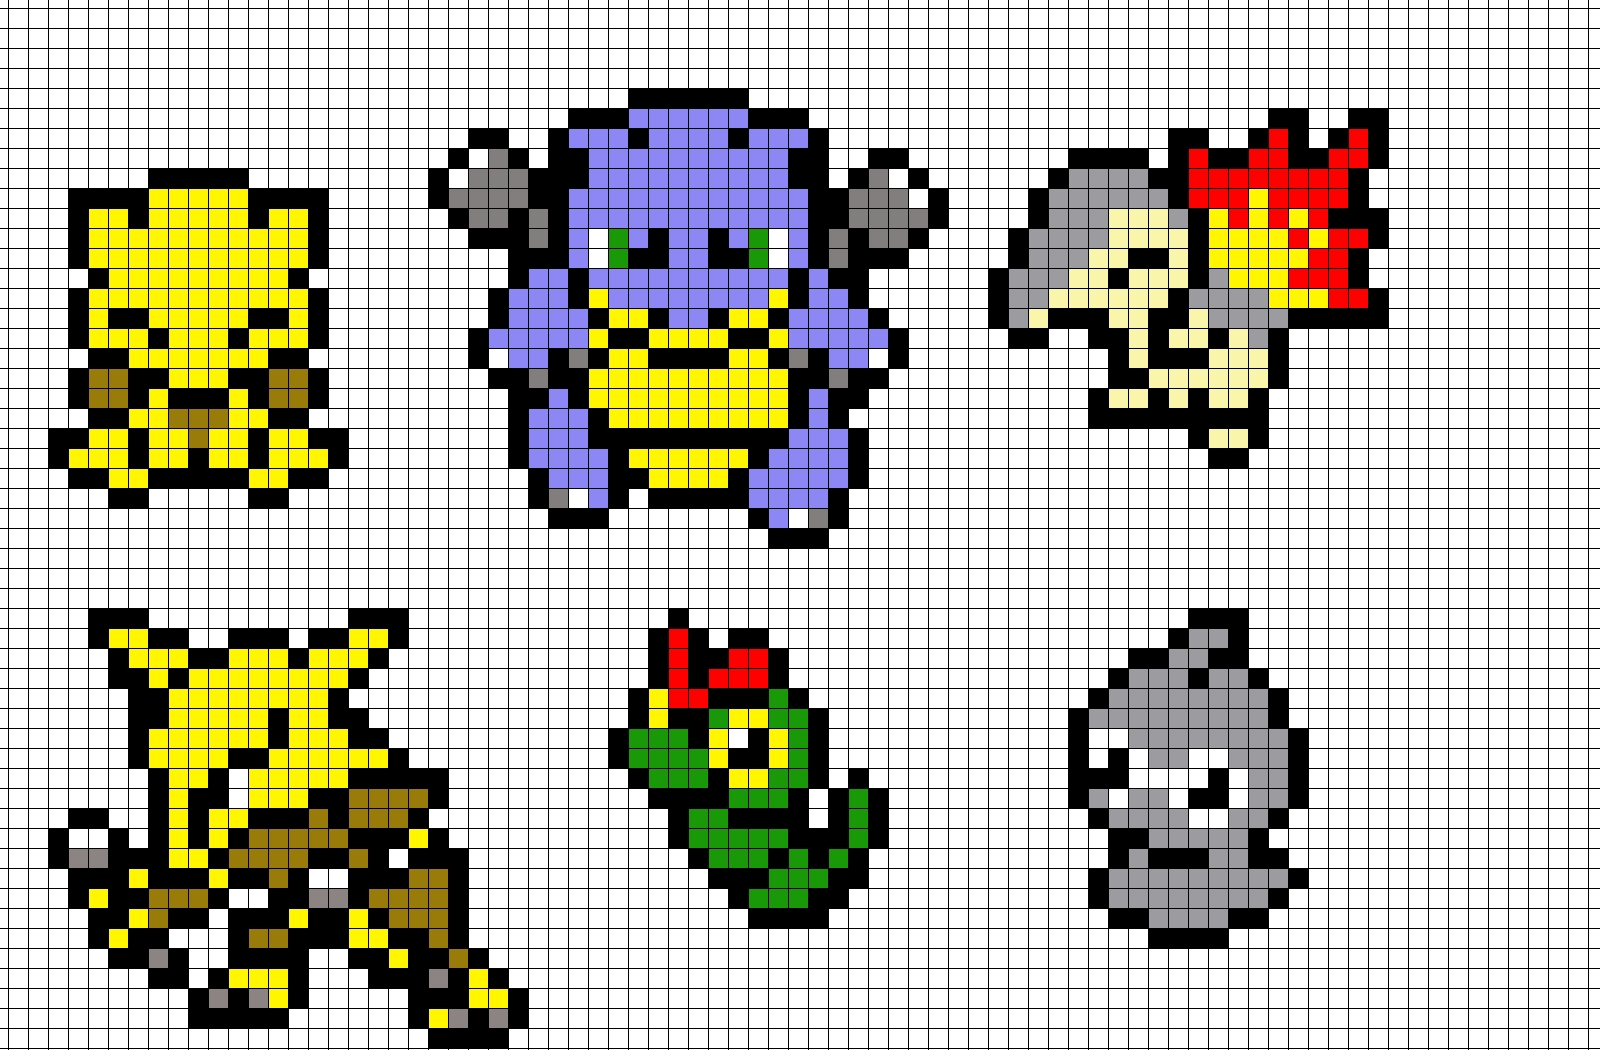 Minecraft Pokemon Pixel Art Easy Minecraft Pokemon Pixel Art Kanto 151 Download Youtube